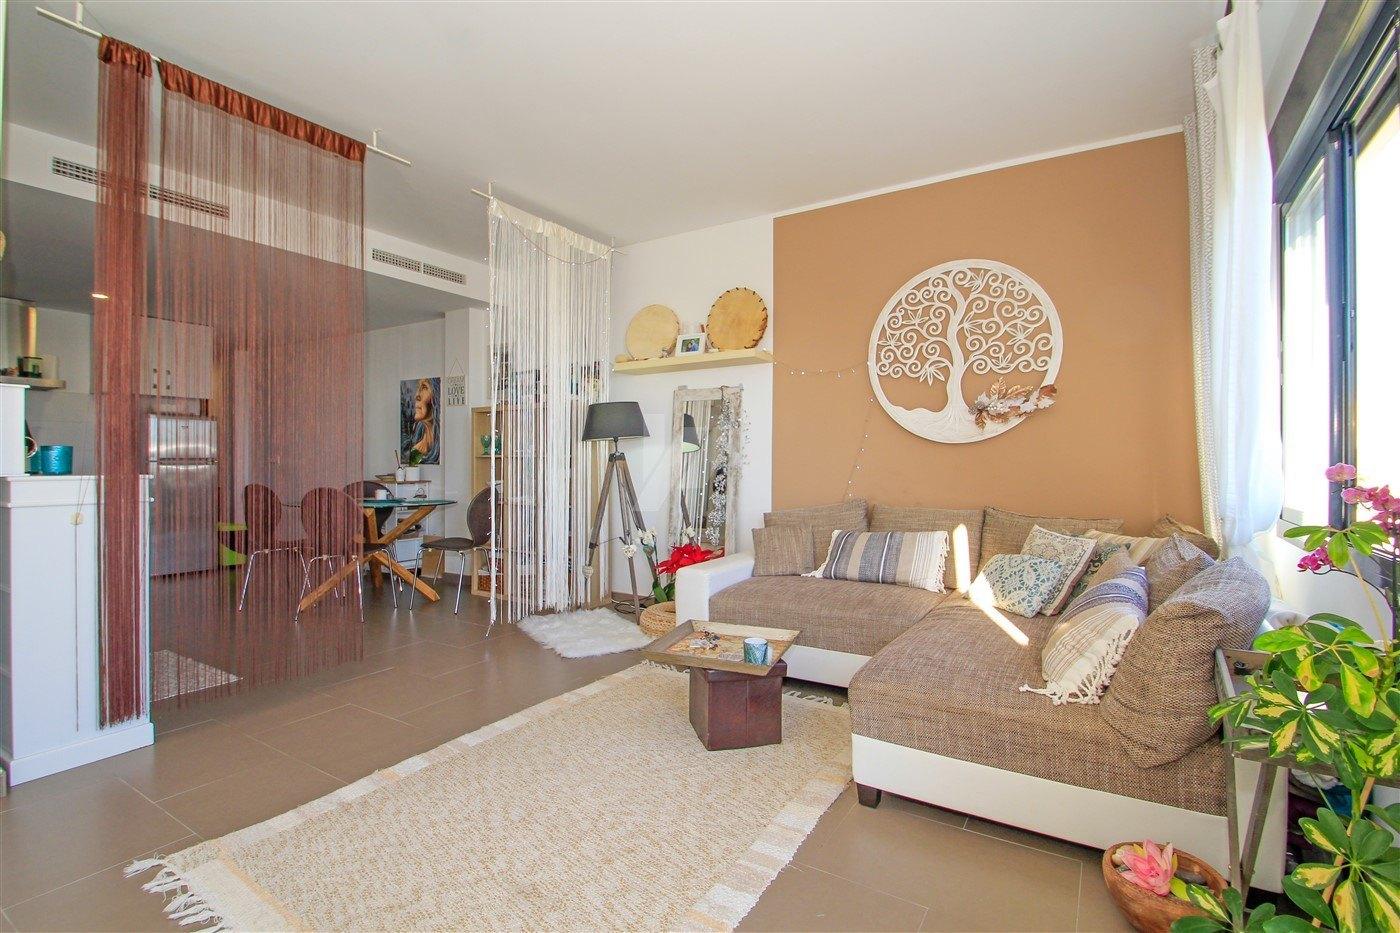 Sea view apartment for sale in Benitachell, Costa Blanca.